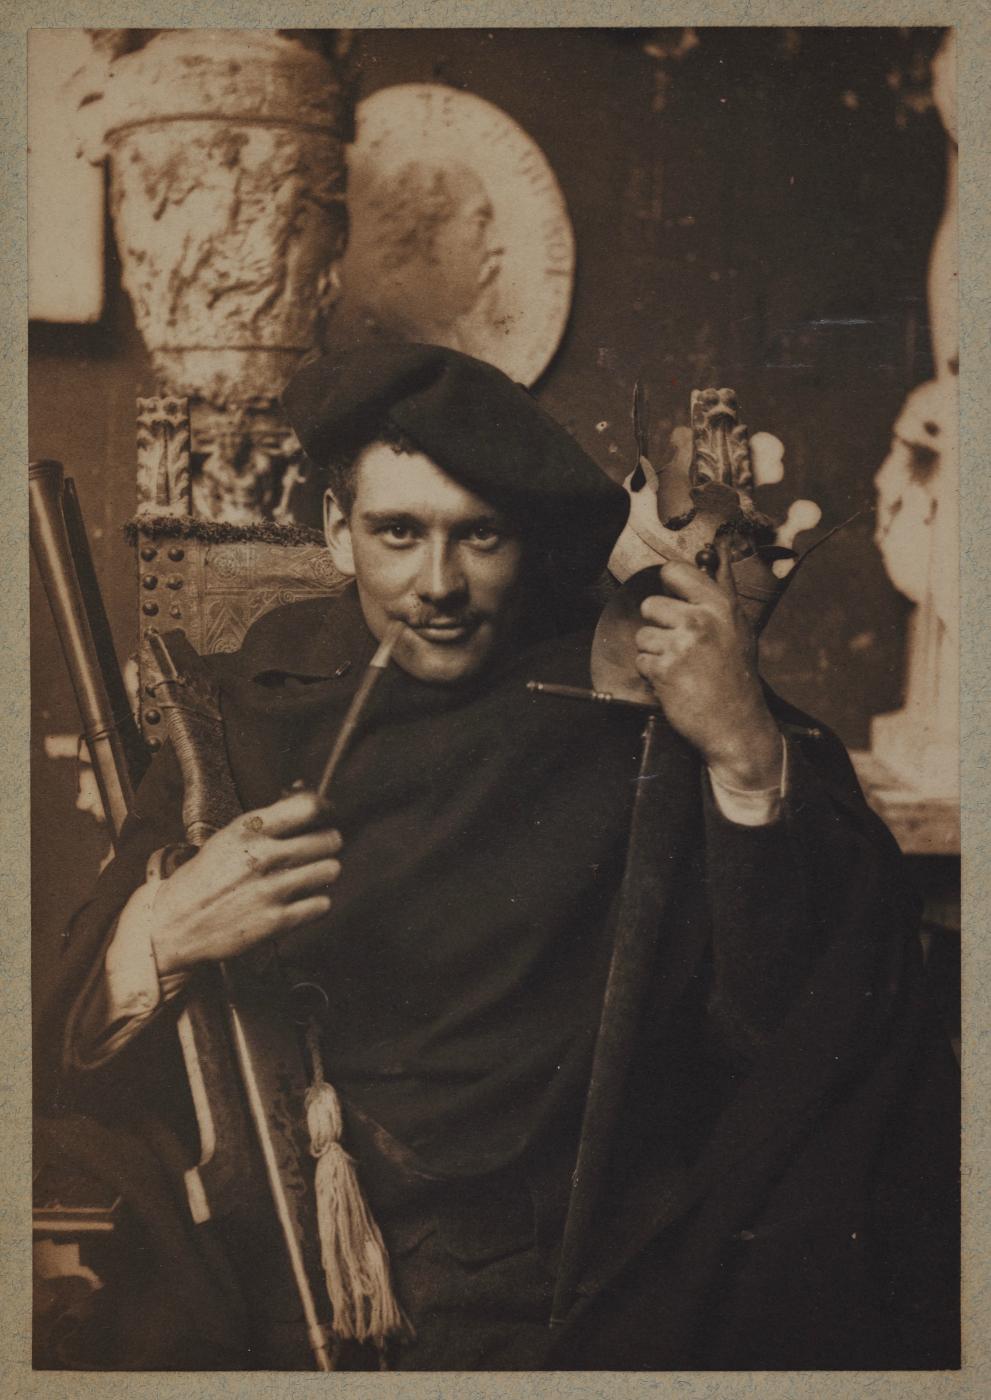 Robert Winthrop Chanler: Discovering the Fantastic